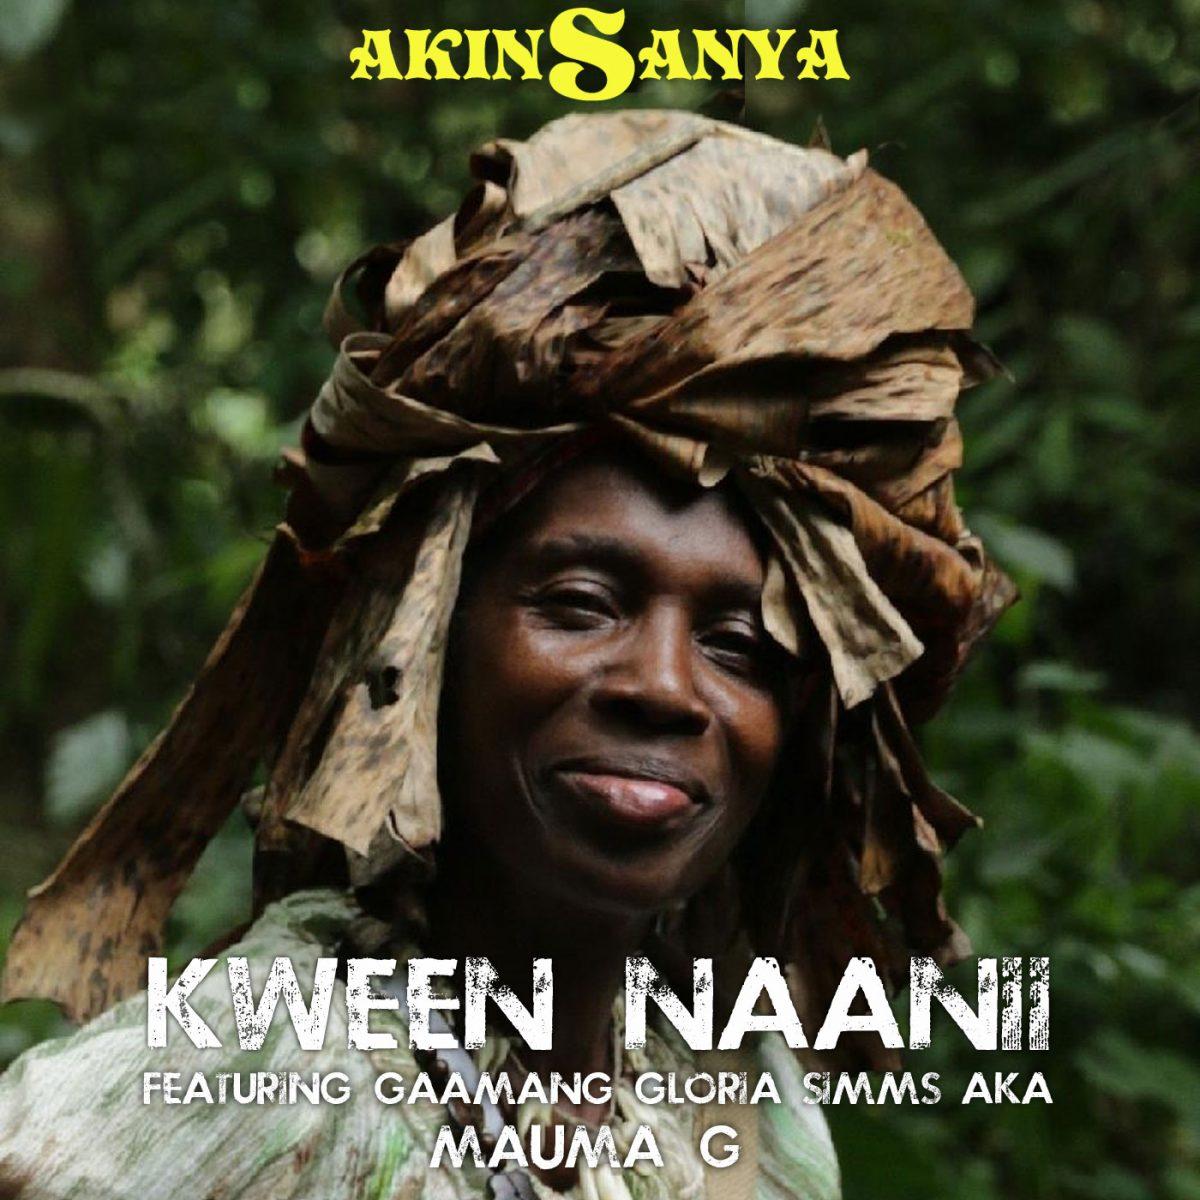 Akinsanya - Kween Naanii (feat. Mauma G)